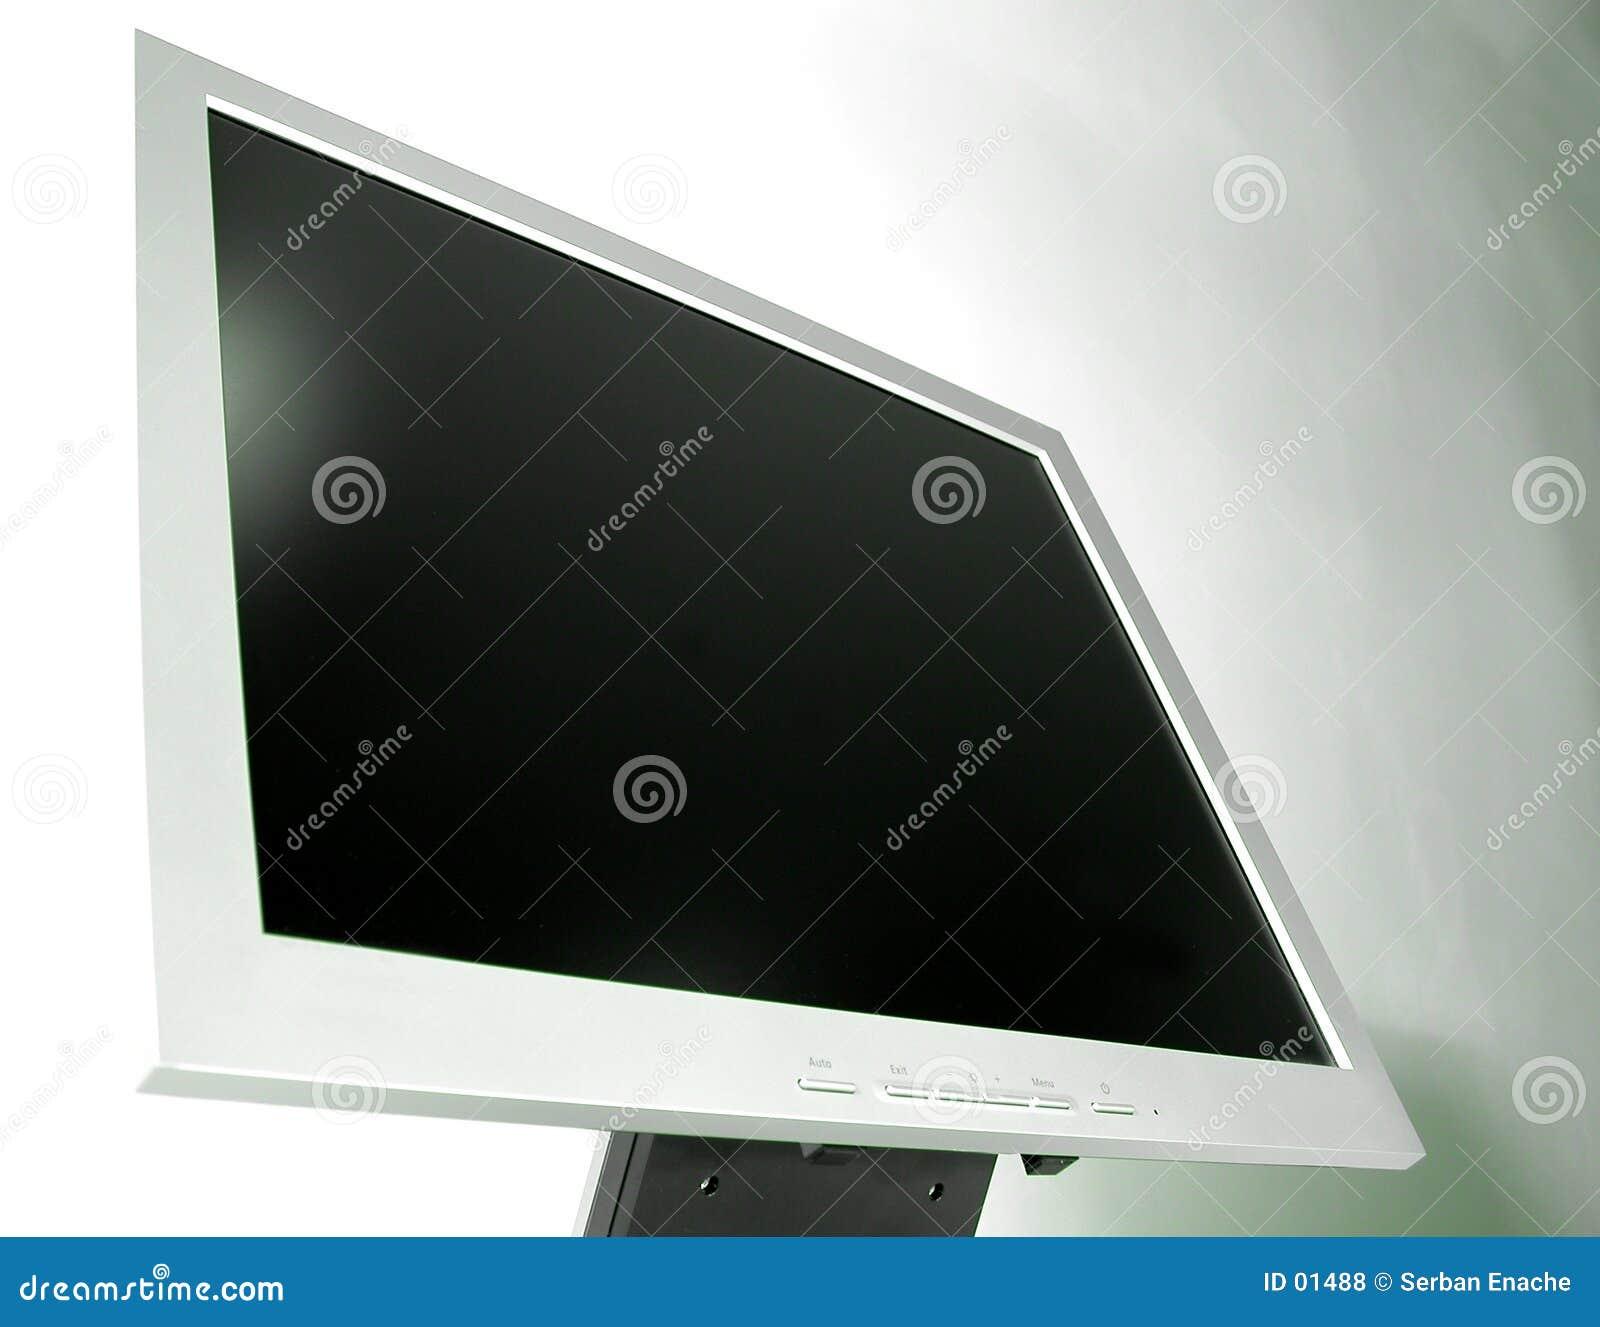 Detail - Slim LCD monitor